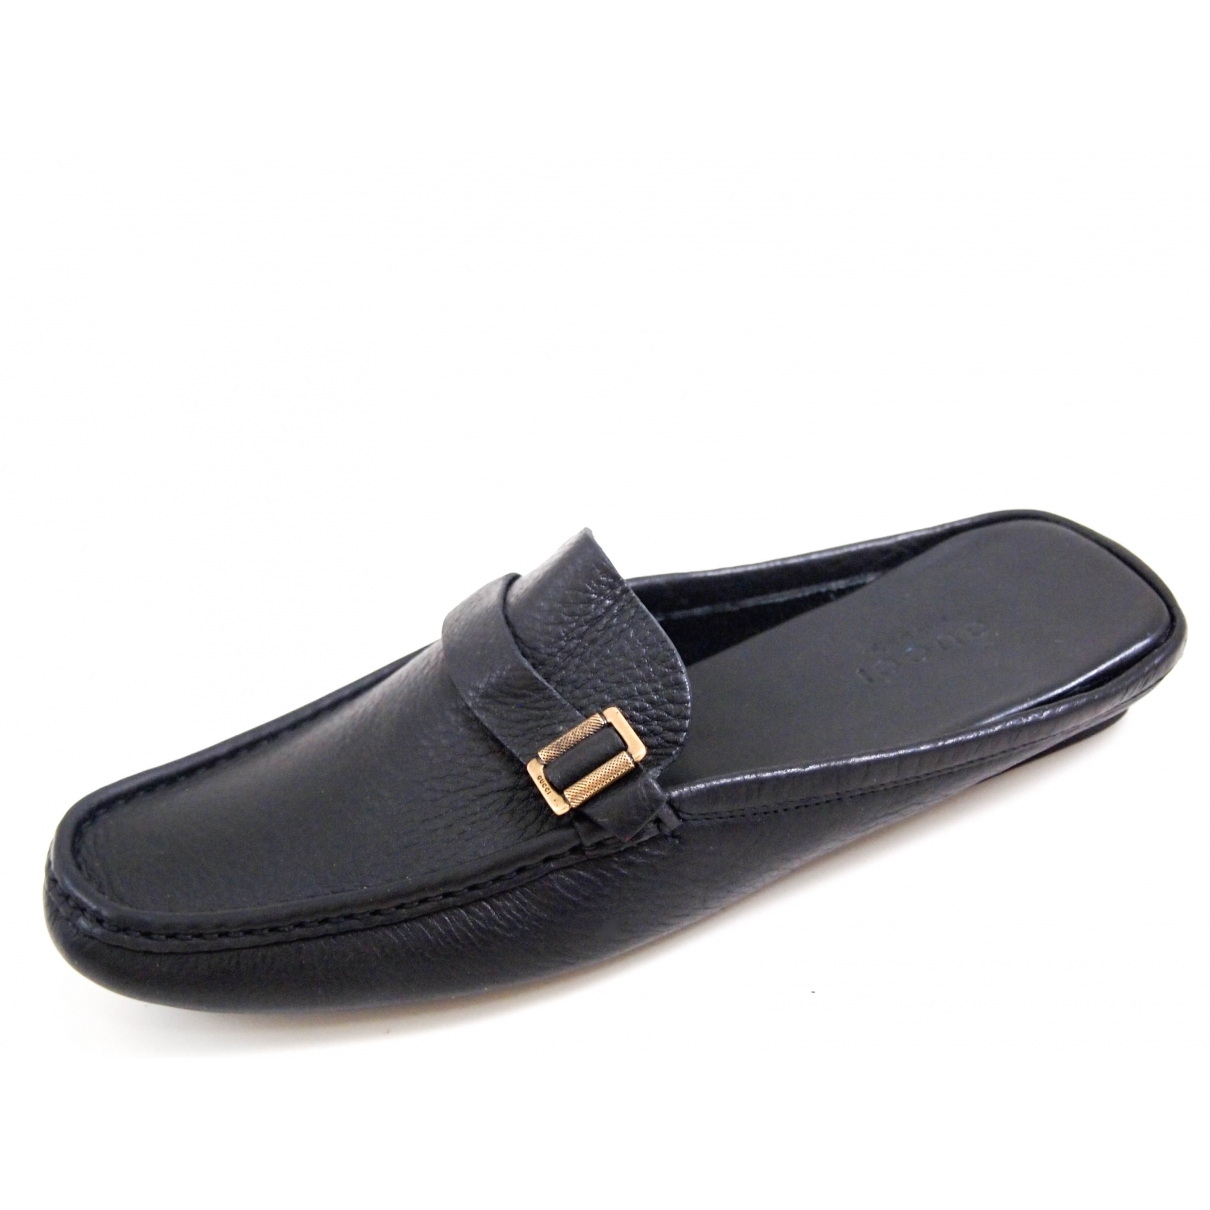 Gucci \N Black Leather Mules & Clogs for Women 35 EU